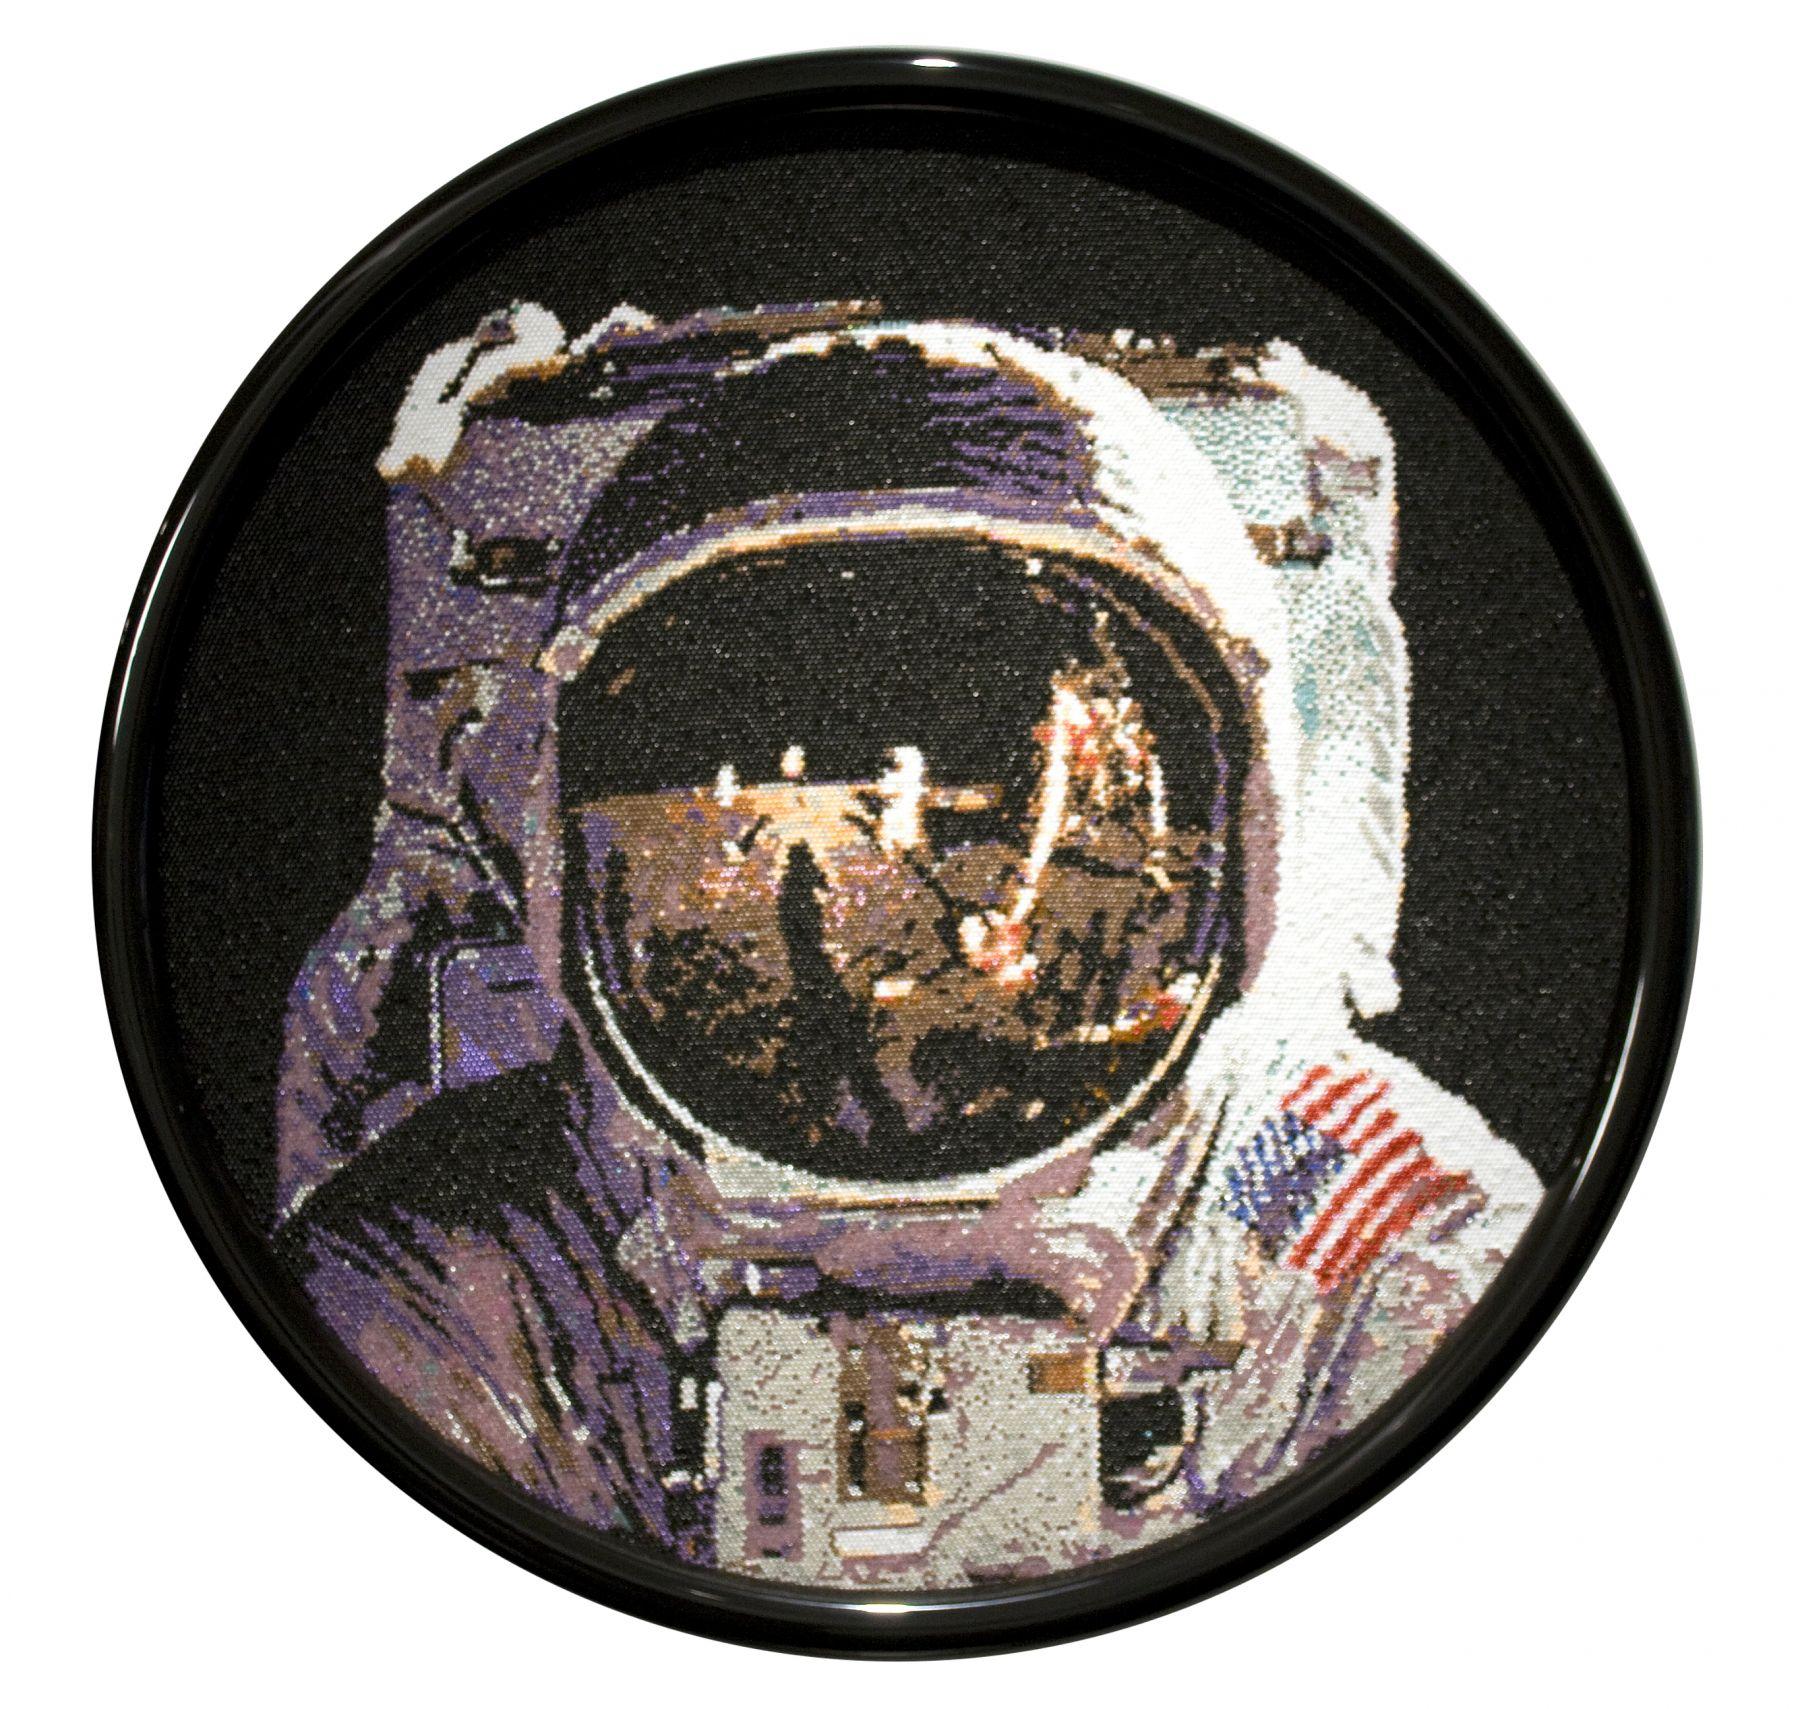 david mach, Neil Armstrong, 2013, pushpins, 39 1/2 inches diameter